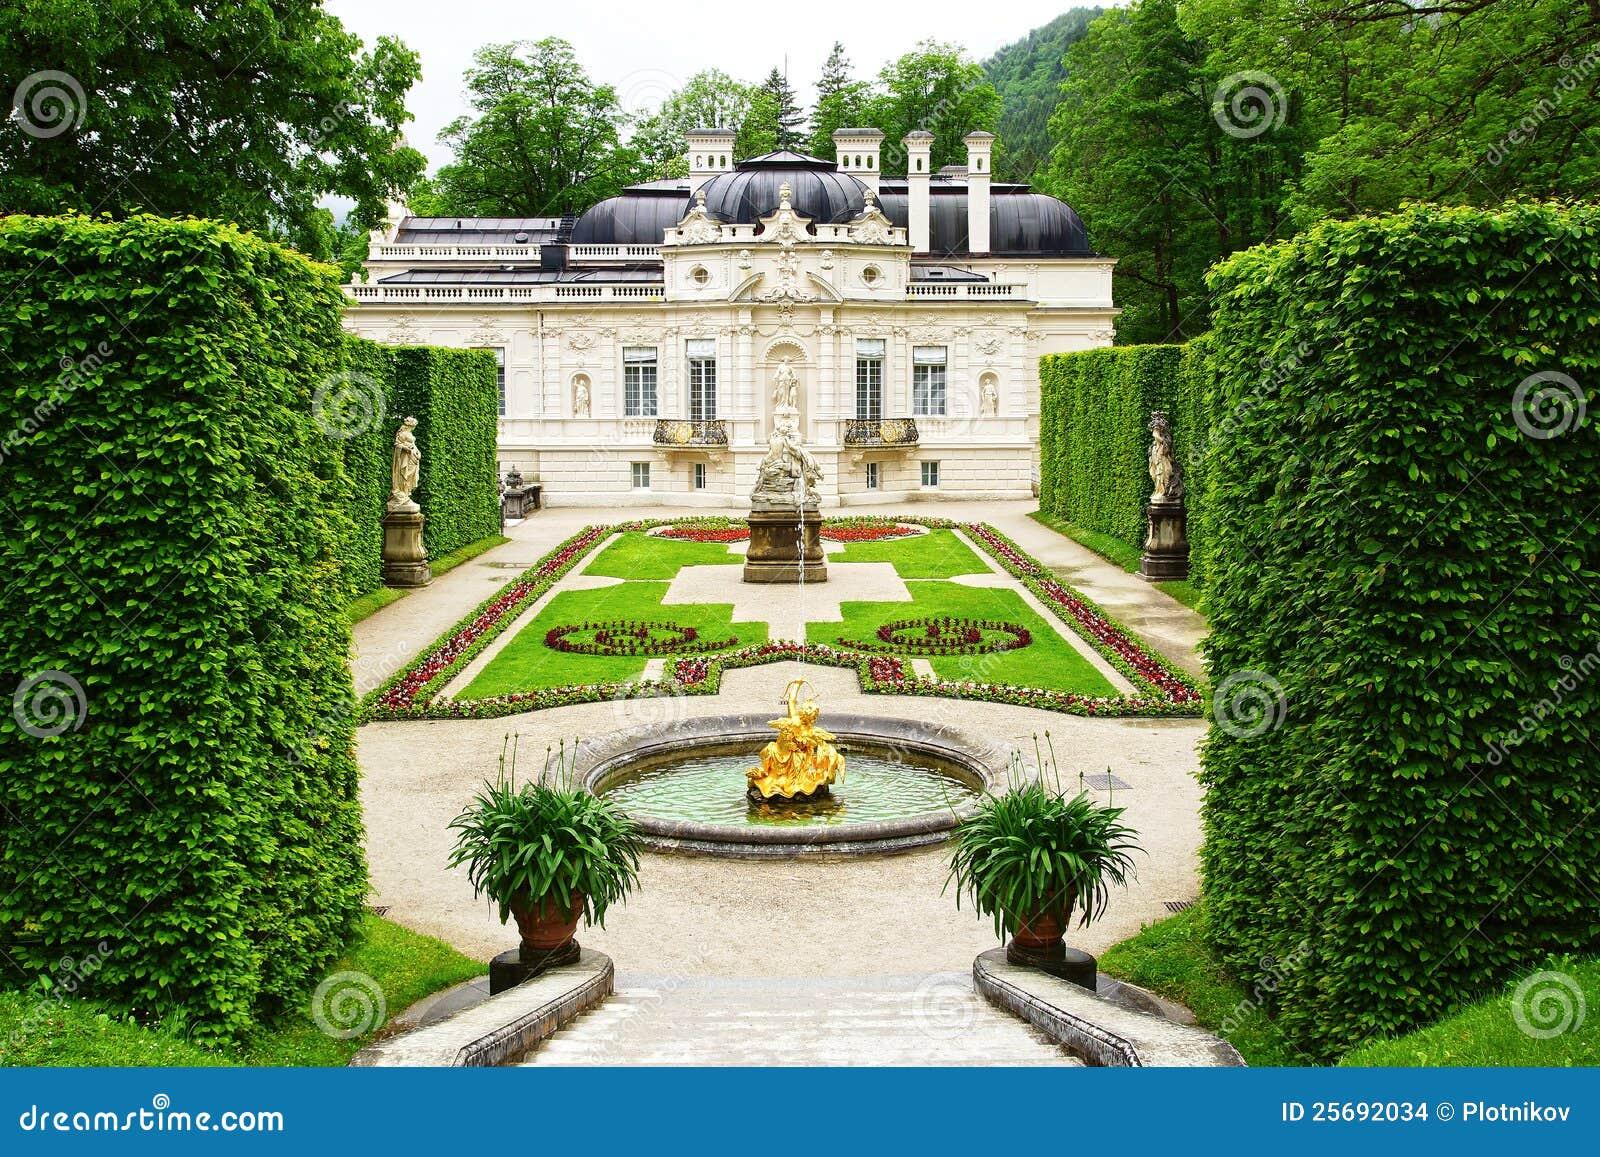 Linderhof Palace Garden. Stock Images - Image: 25692034